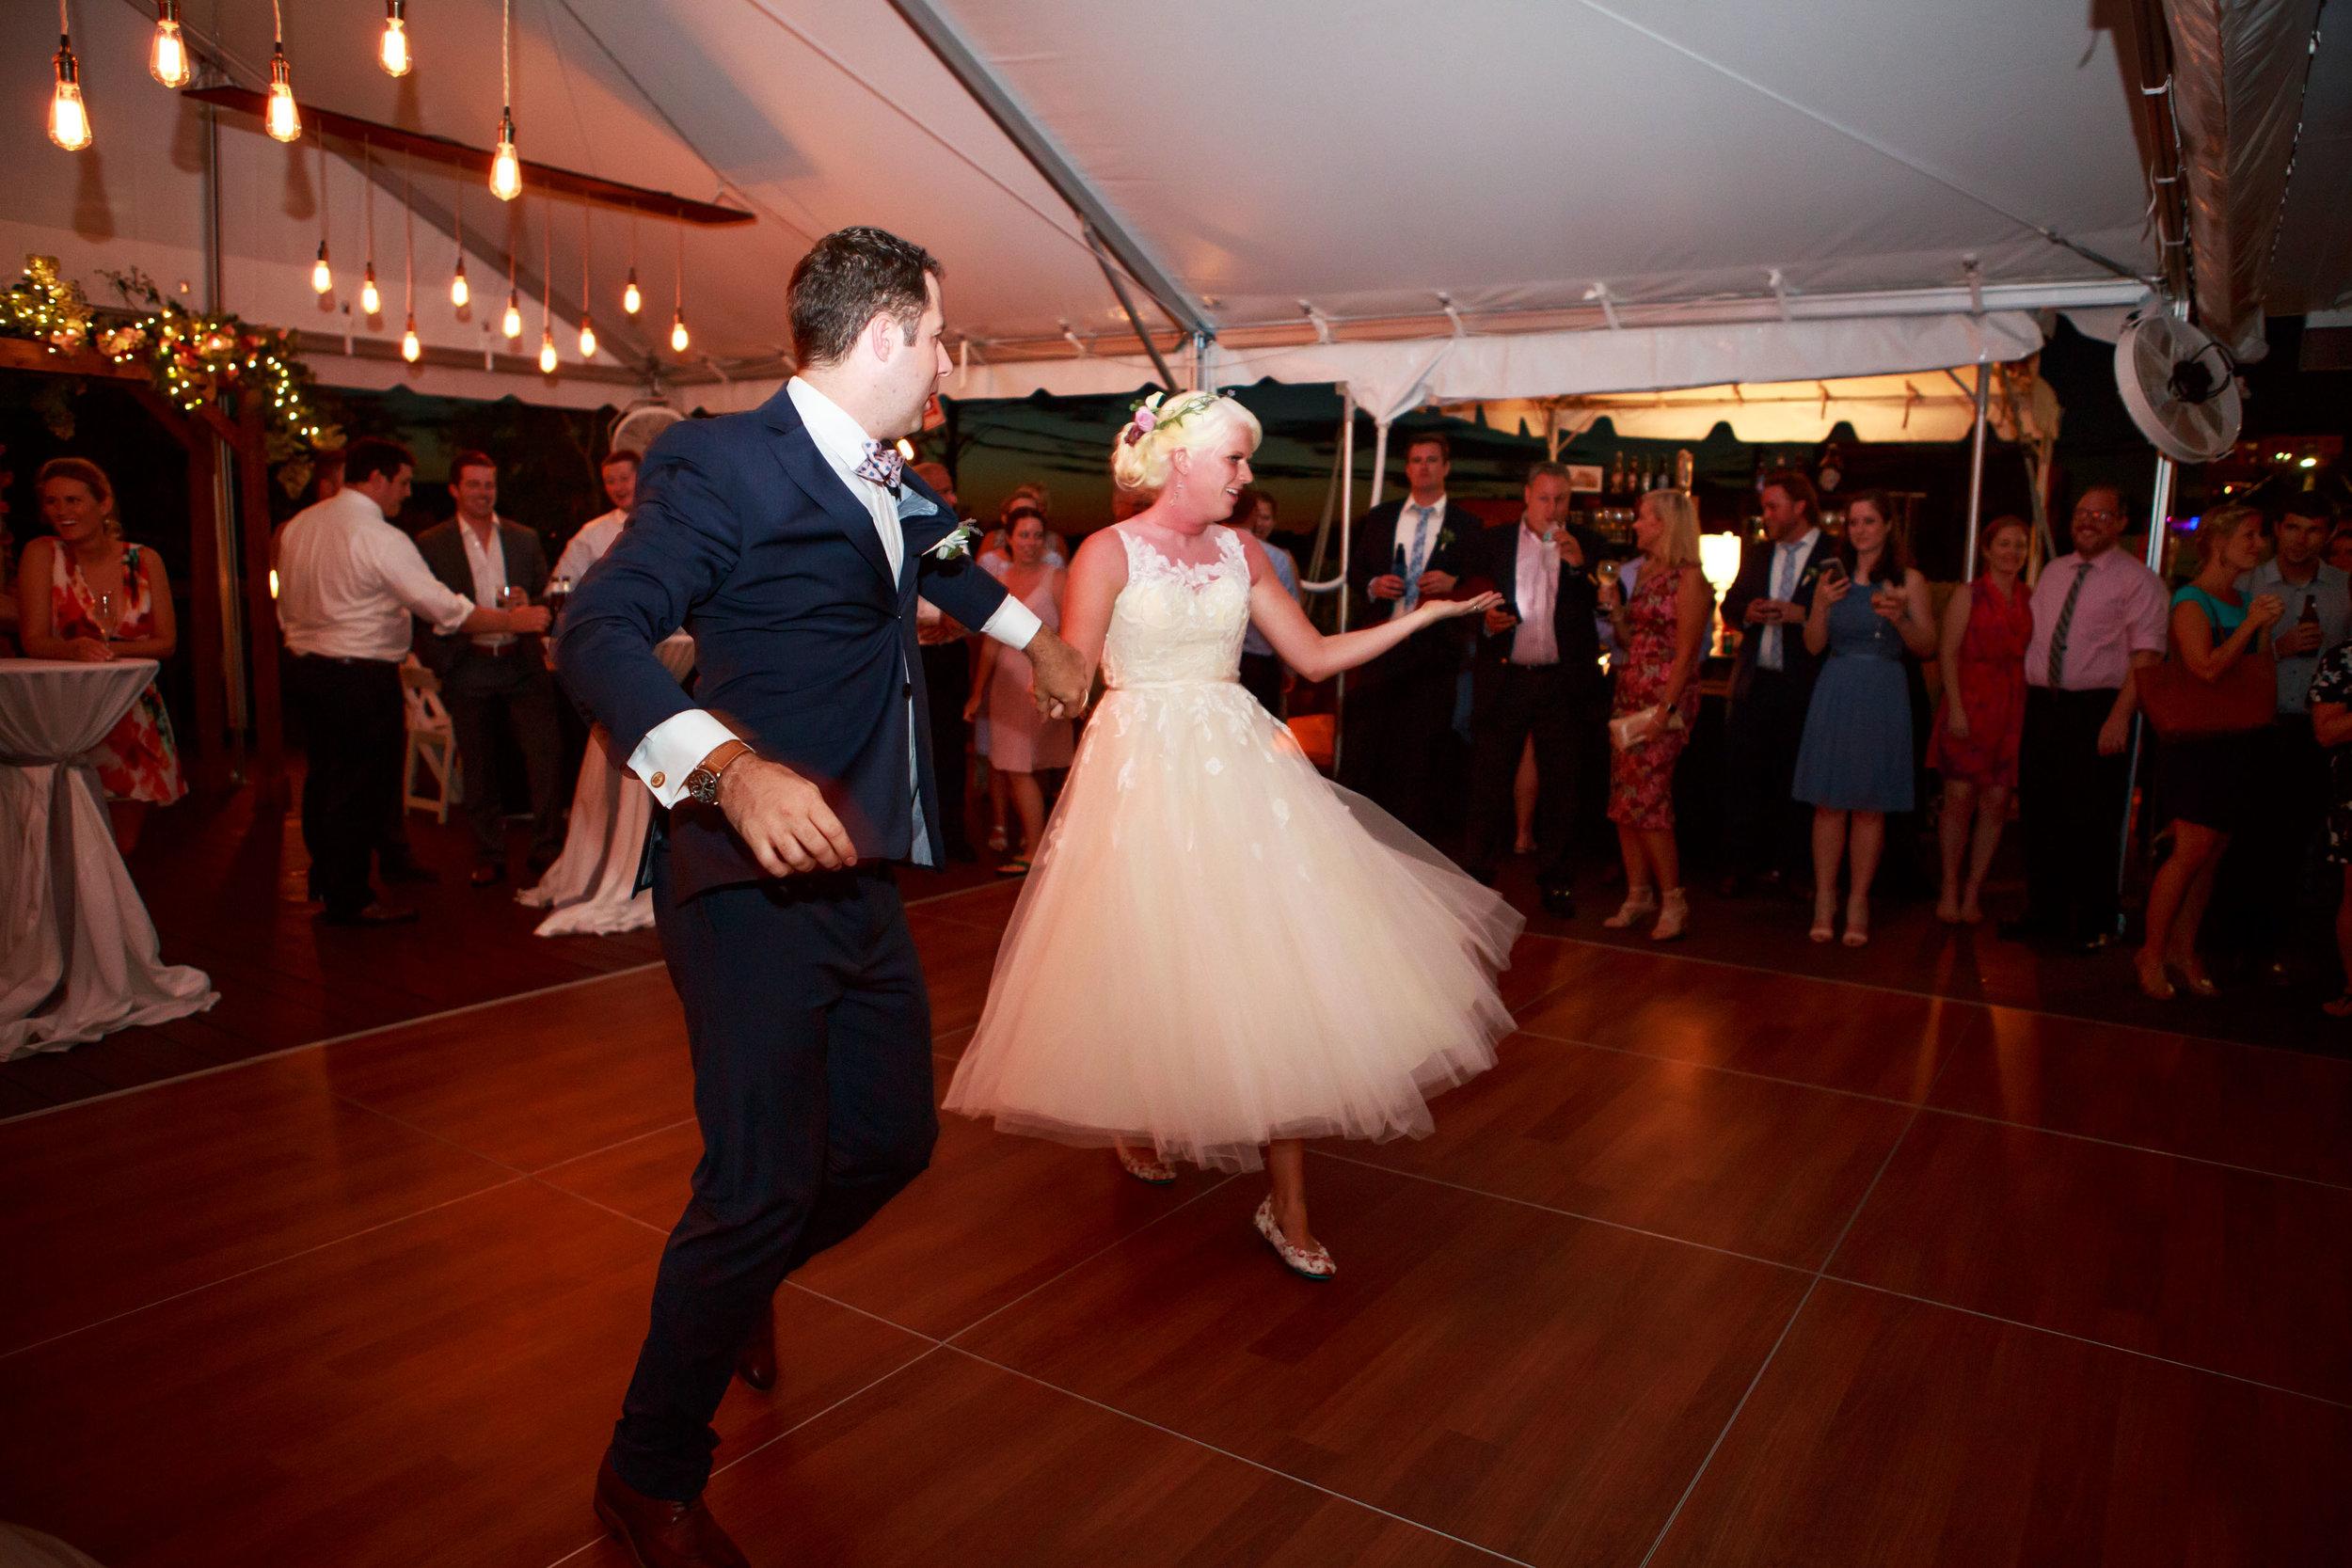 128-South-Wedding-Wilmington-NC-Photographer-Reception-143.jpg